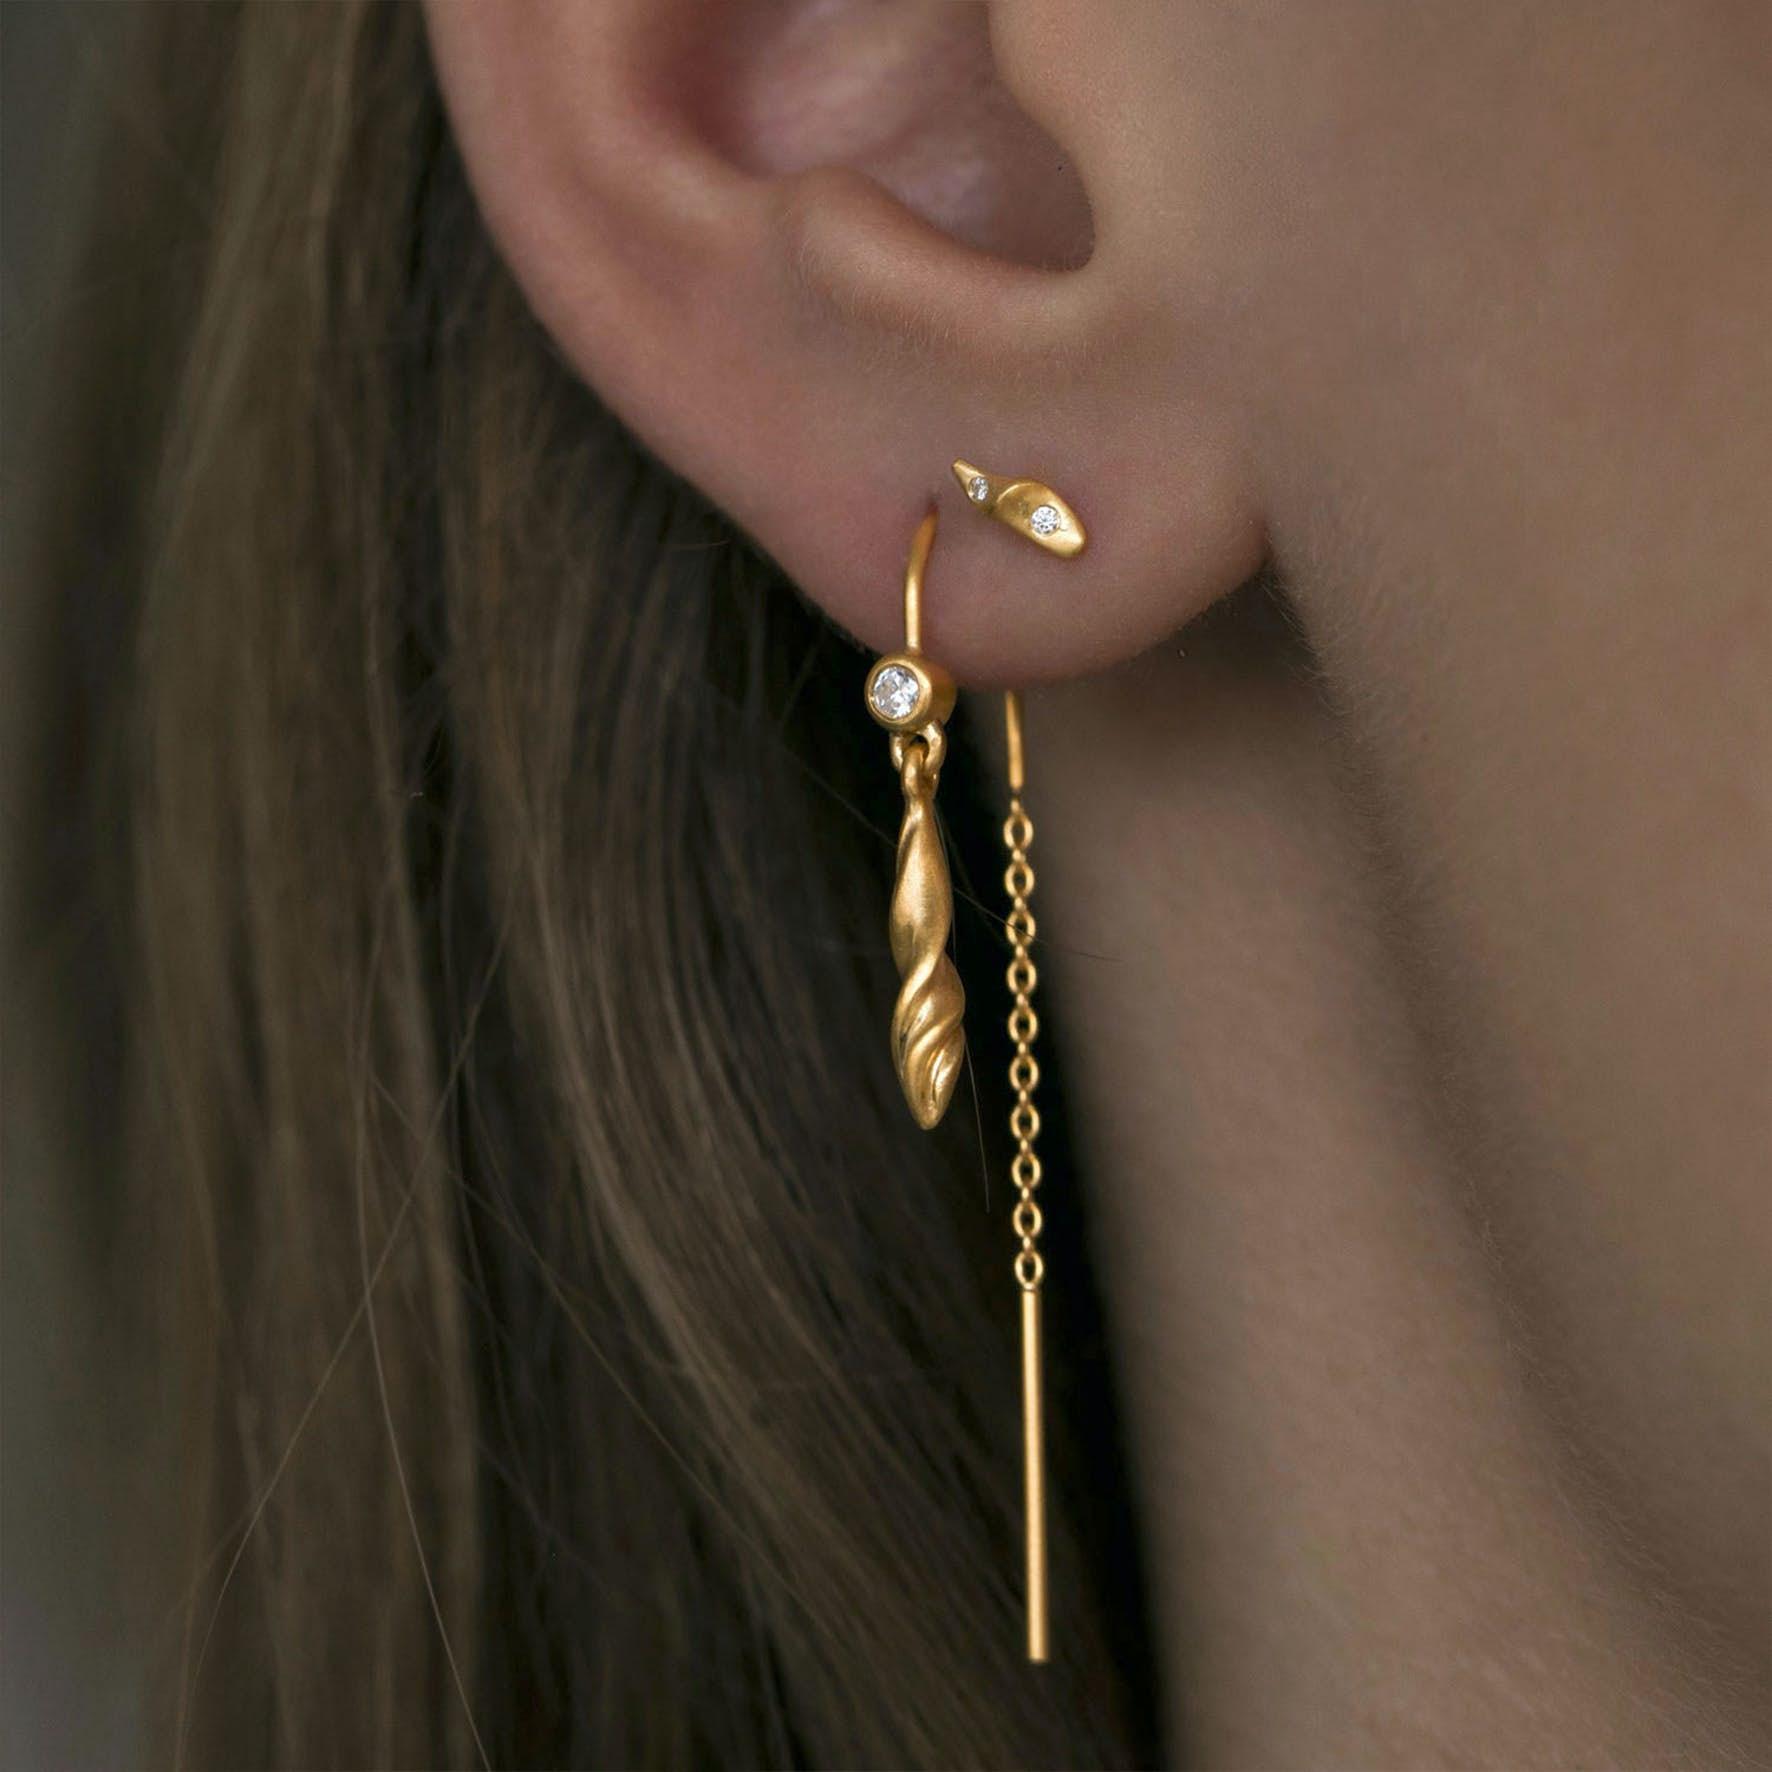 Dangling Petit Velvet Earchain von STINE A Jewelry in Vergoldet-Silber Sterling 925